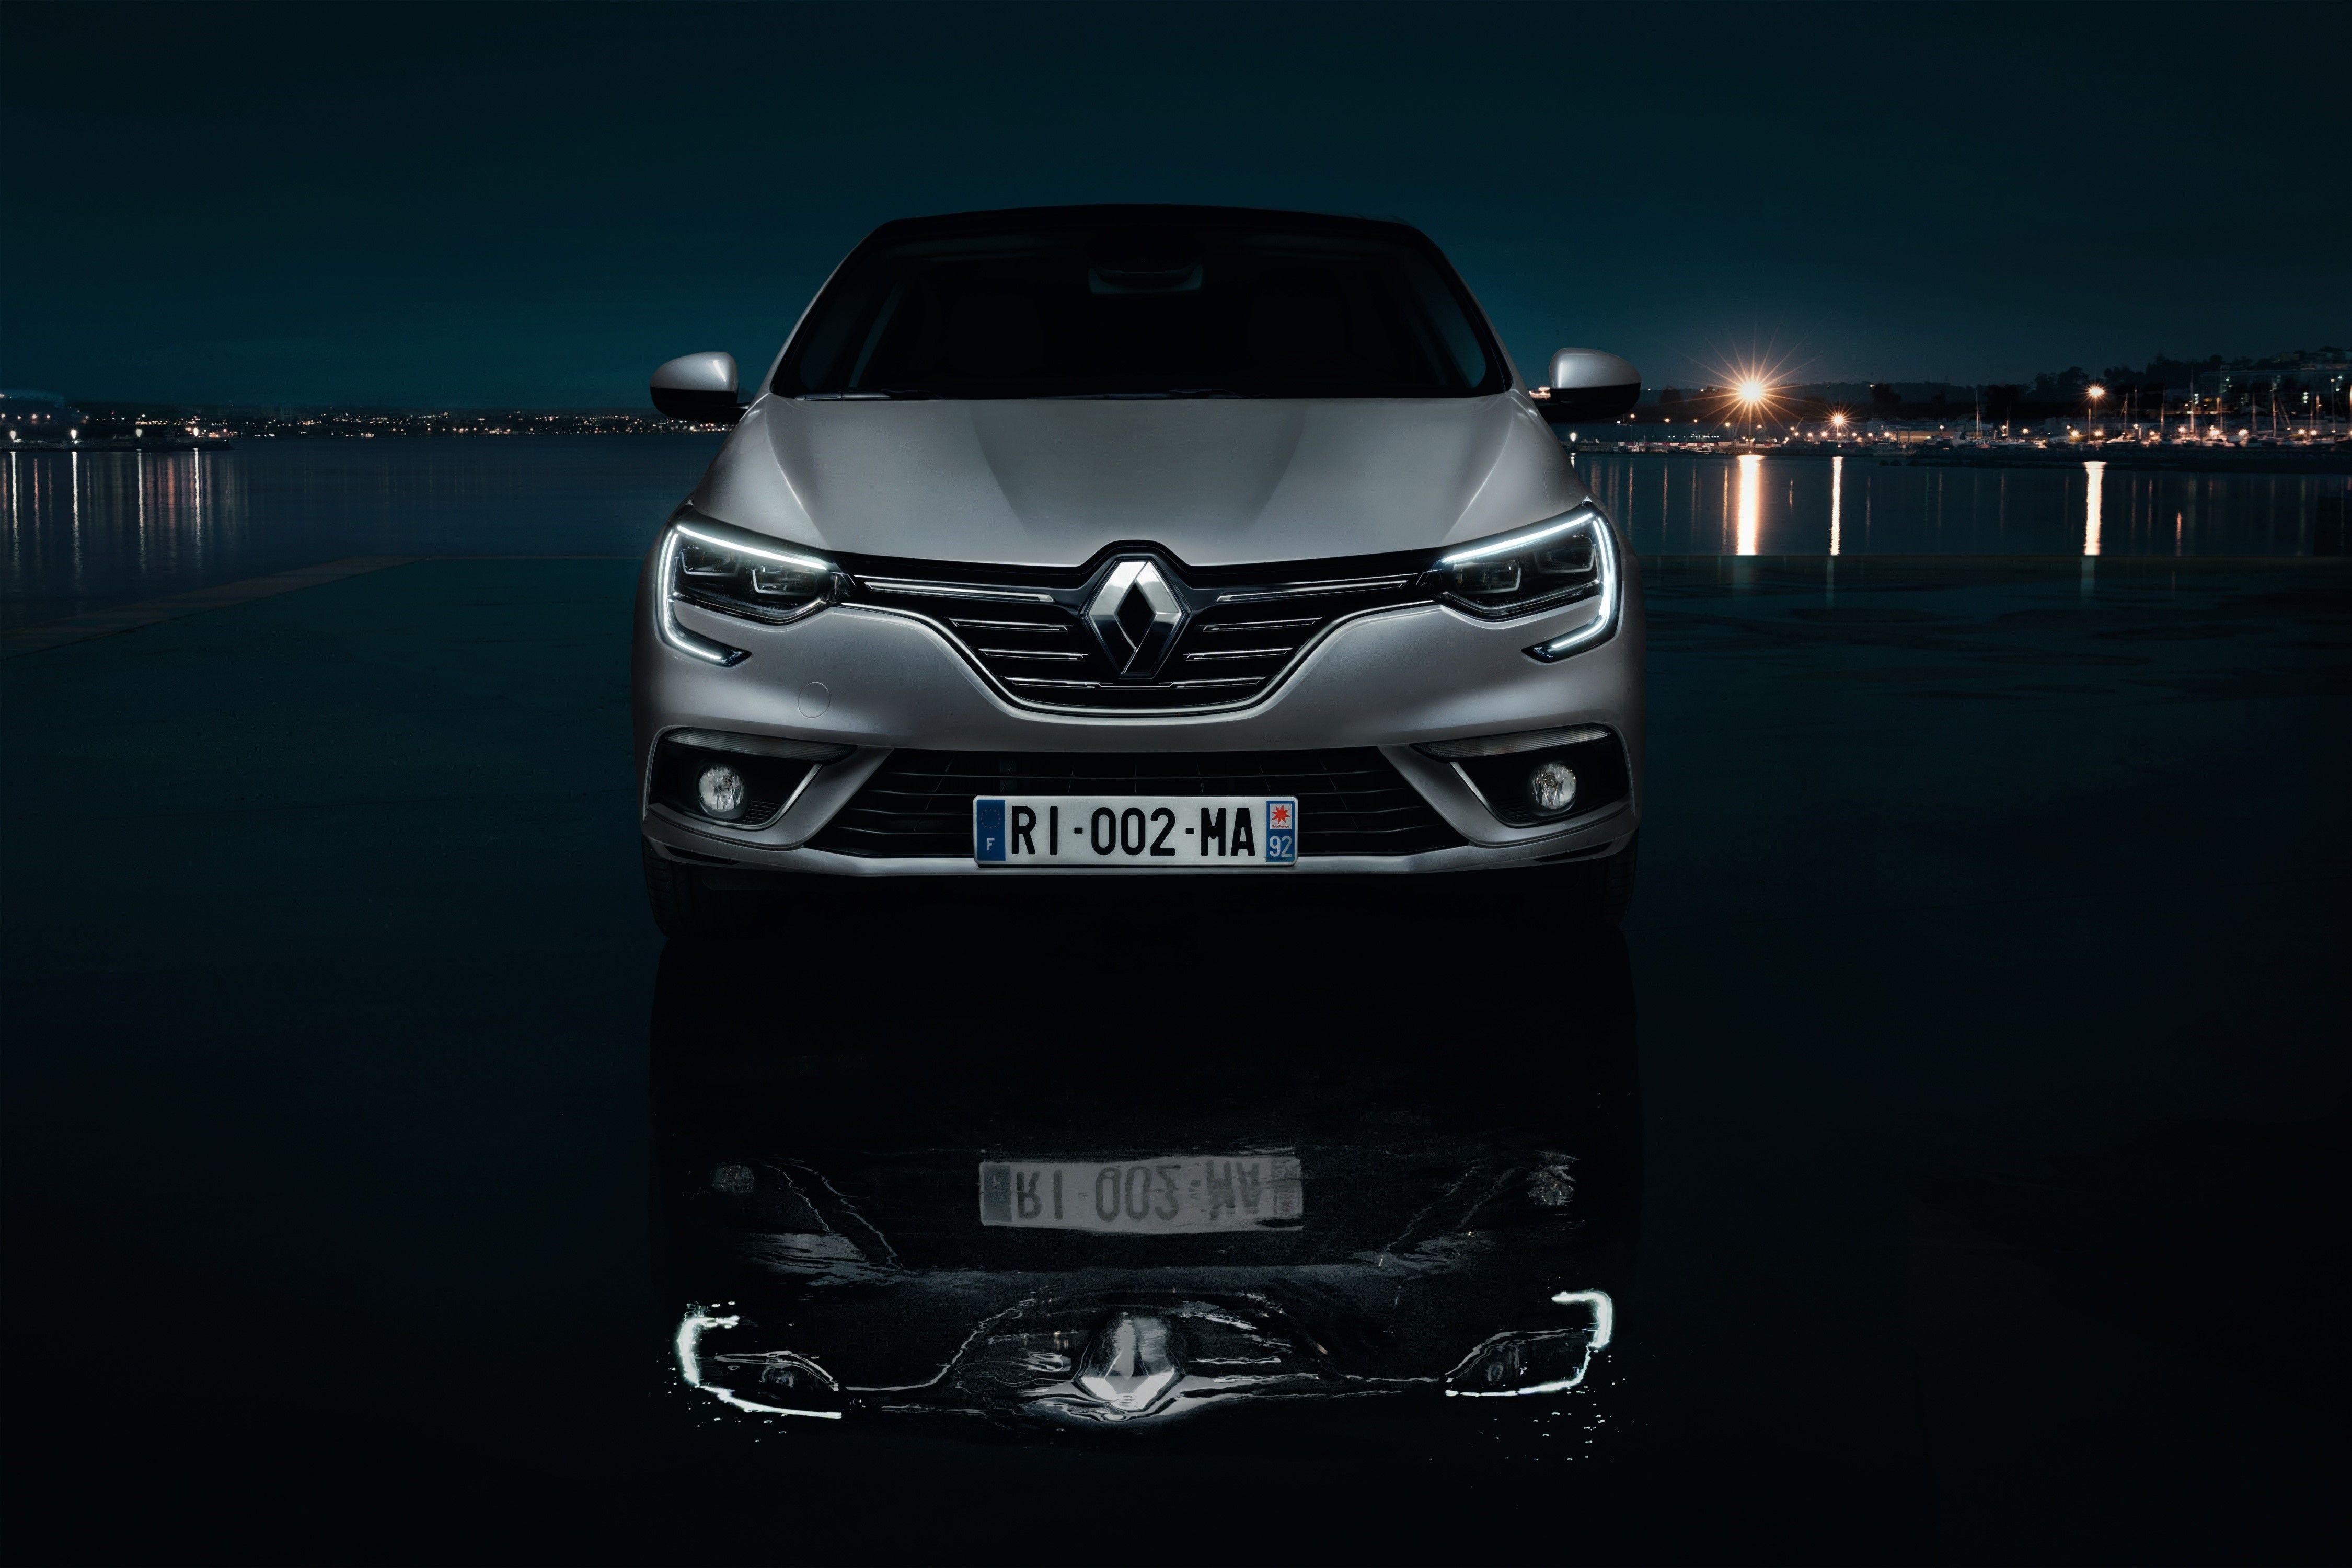 Renault Megane Sedan C Patrick Curtet Prodigious Megane Sedan New Renault Renault Megane